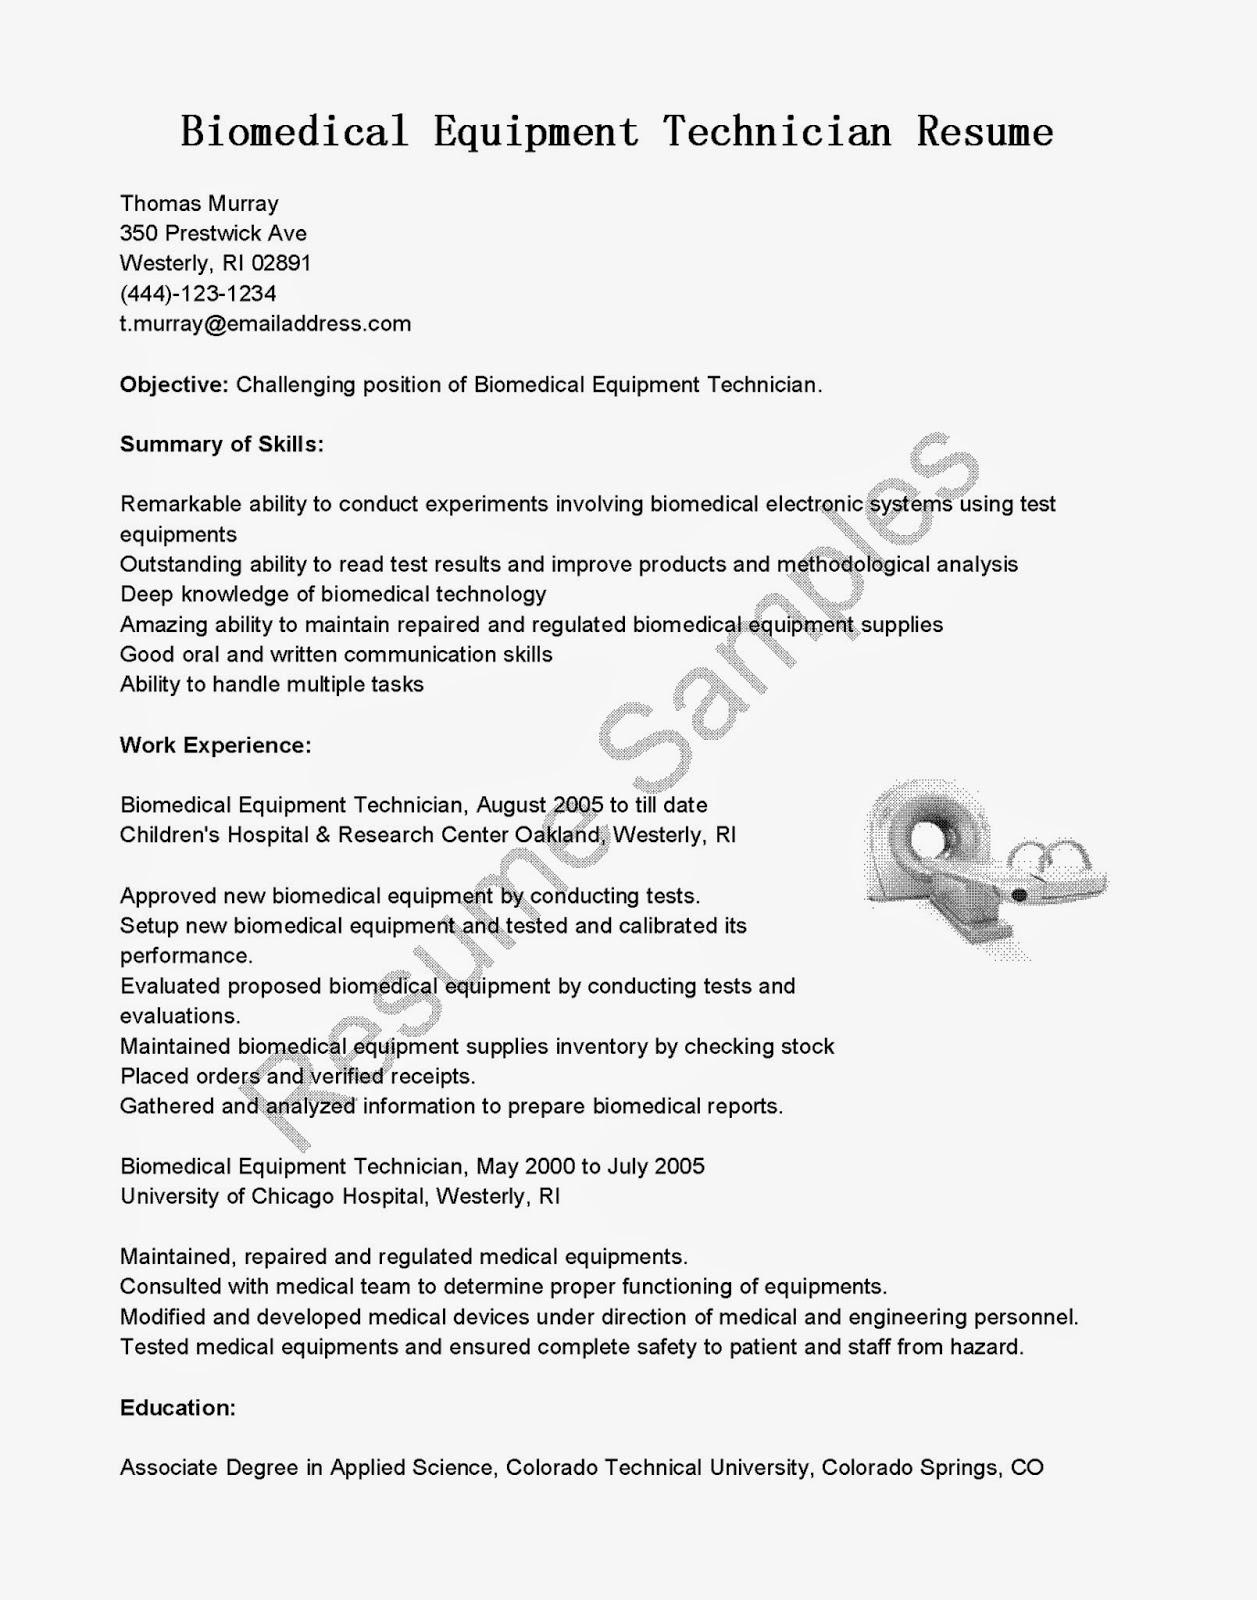 Biomedical service technician resume